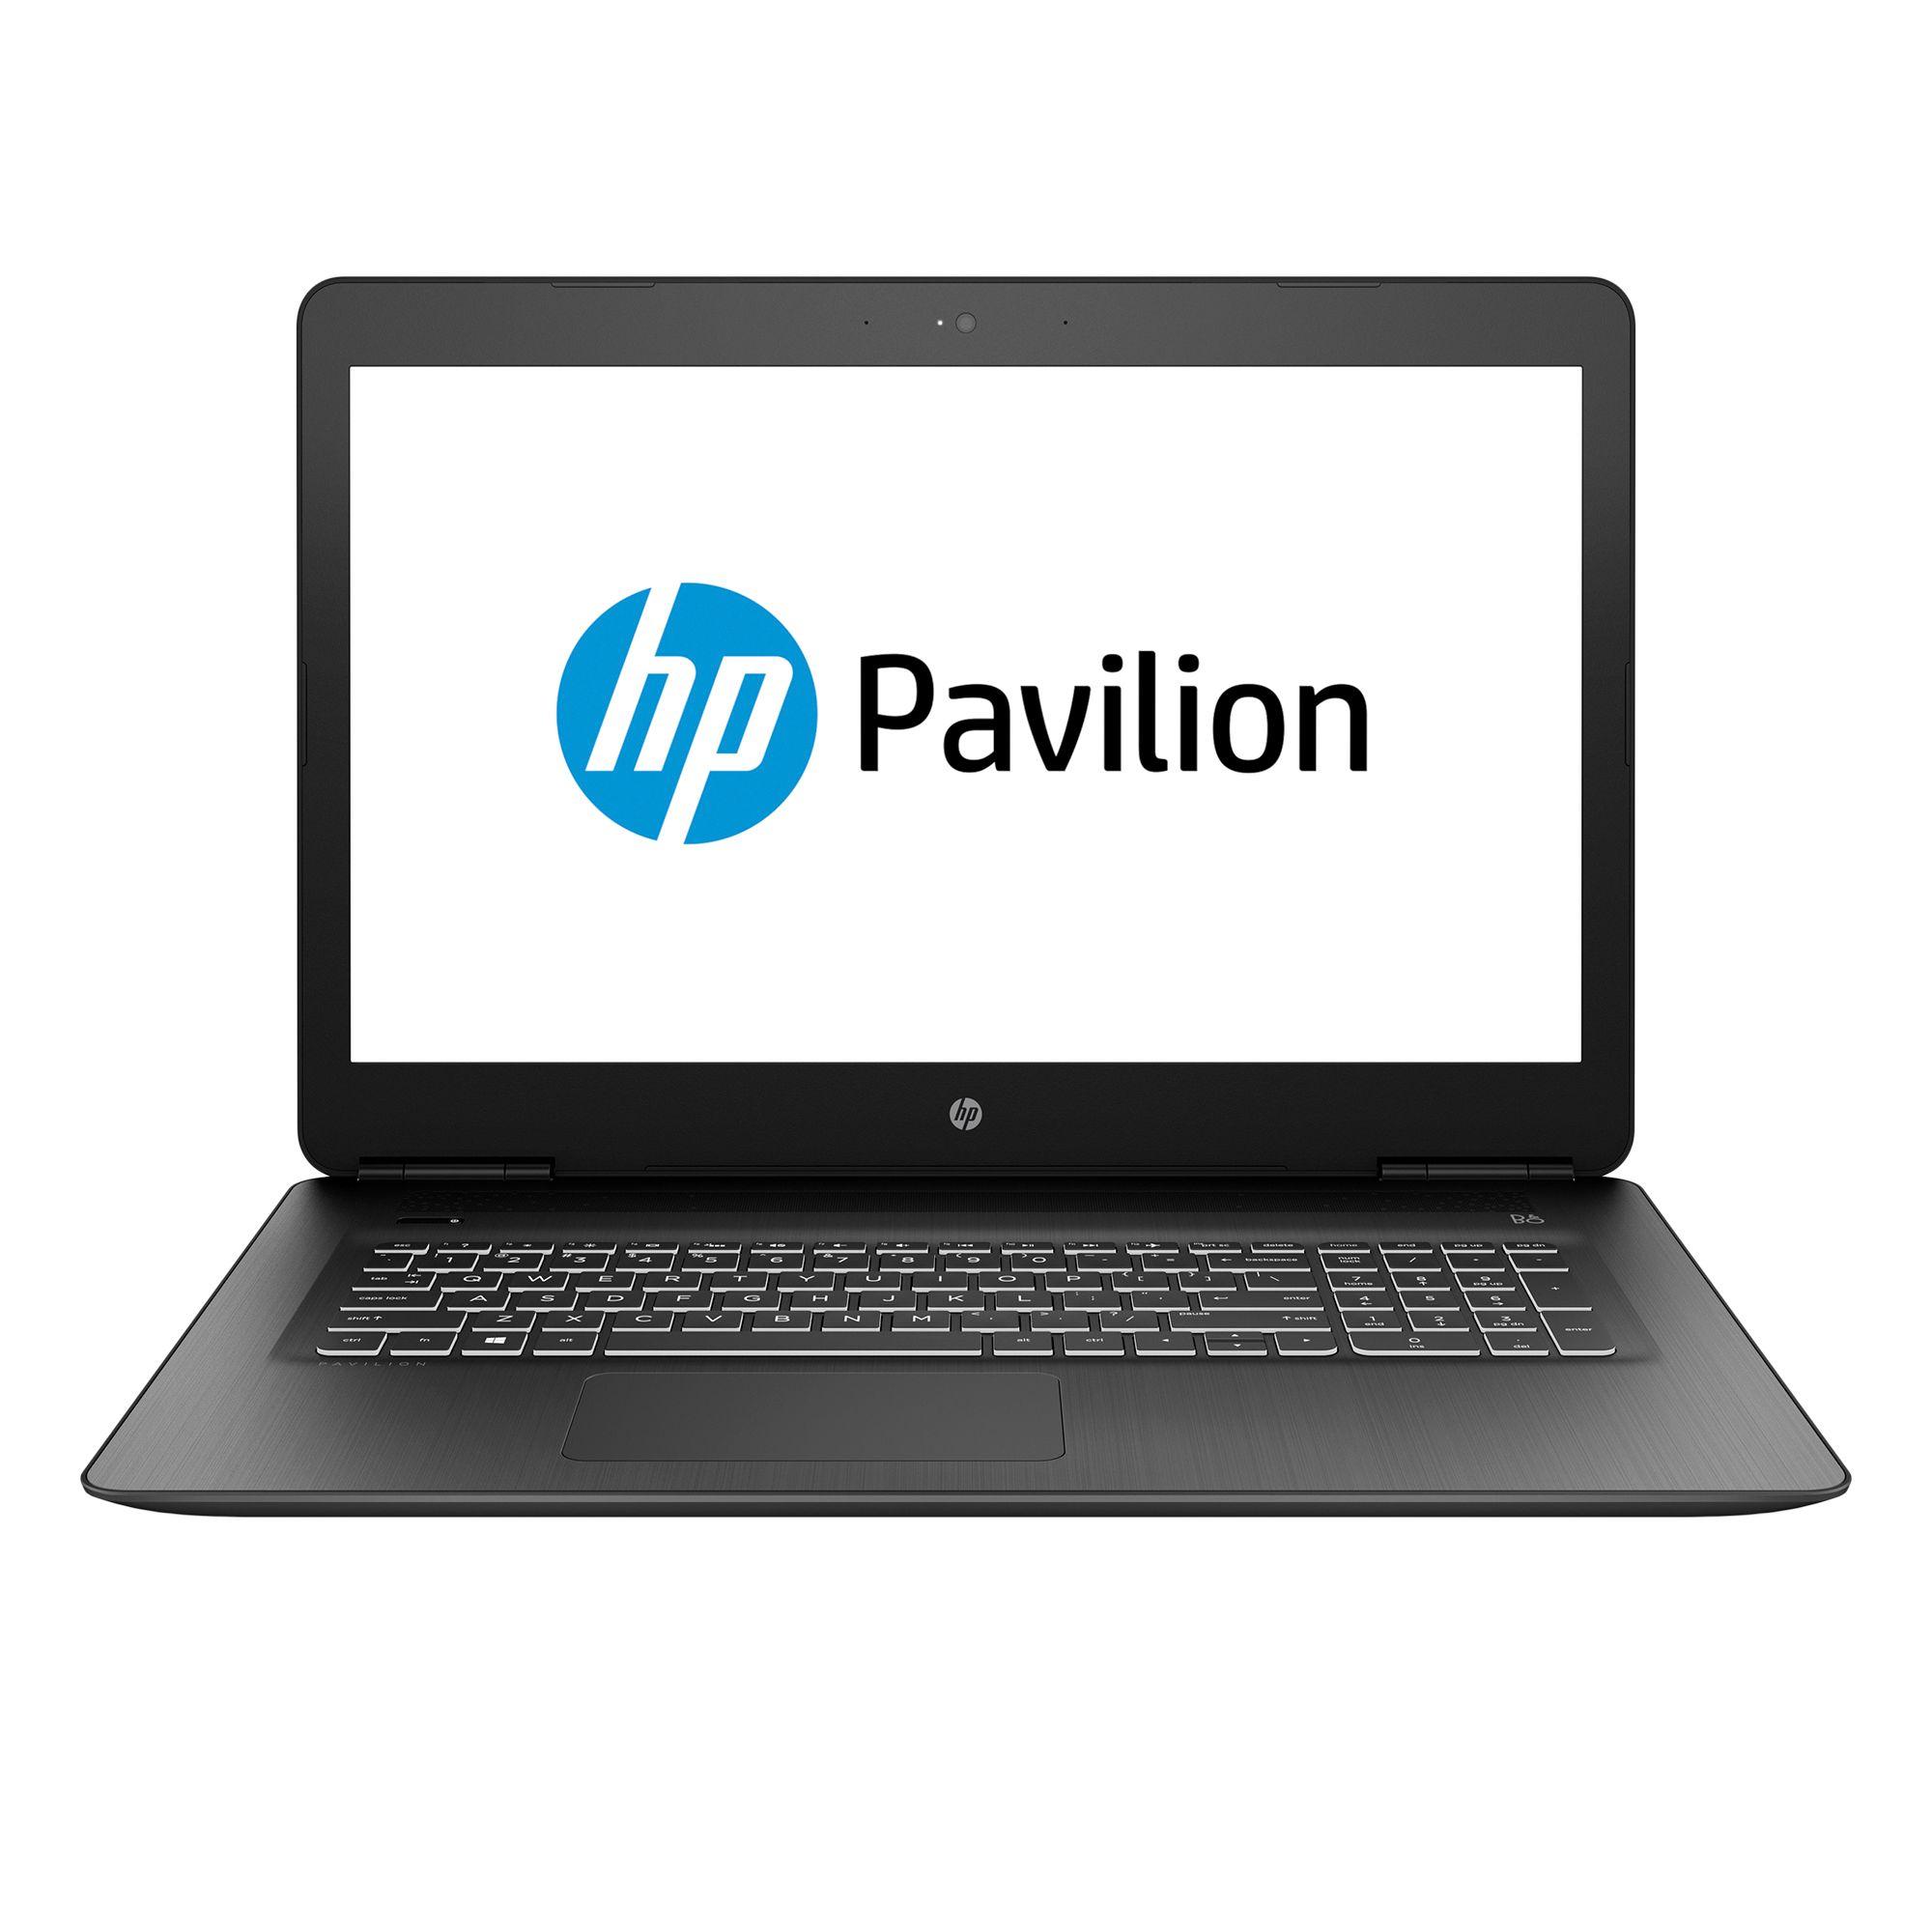 Notebook HP Pavilion 17 17.3 Full HD Intel Core i7-7700HQ GTX 1050 Ti-4GB RAM 12GB HDD 1TB + SSD 128GB FreeDOS